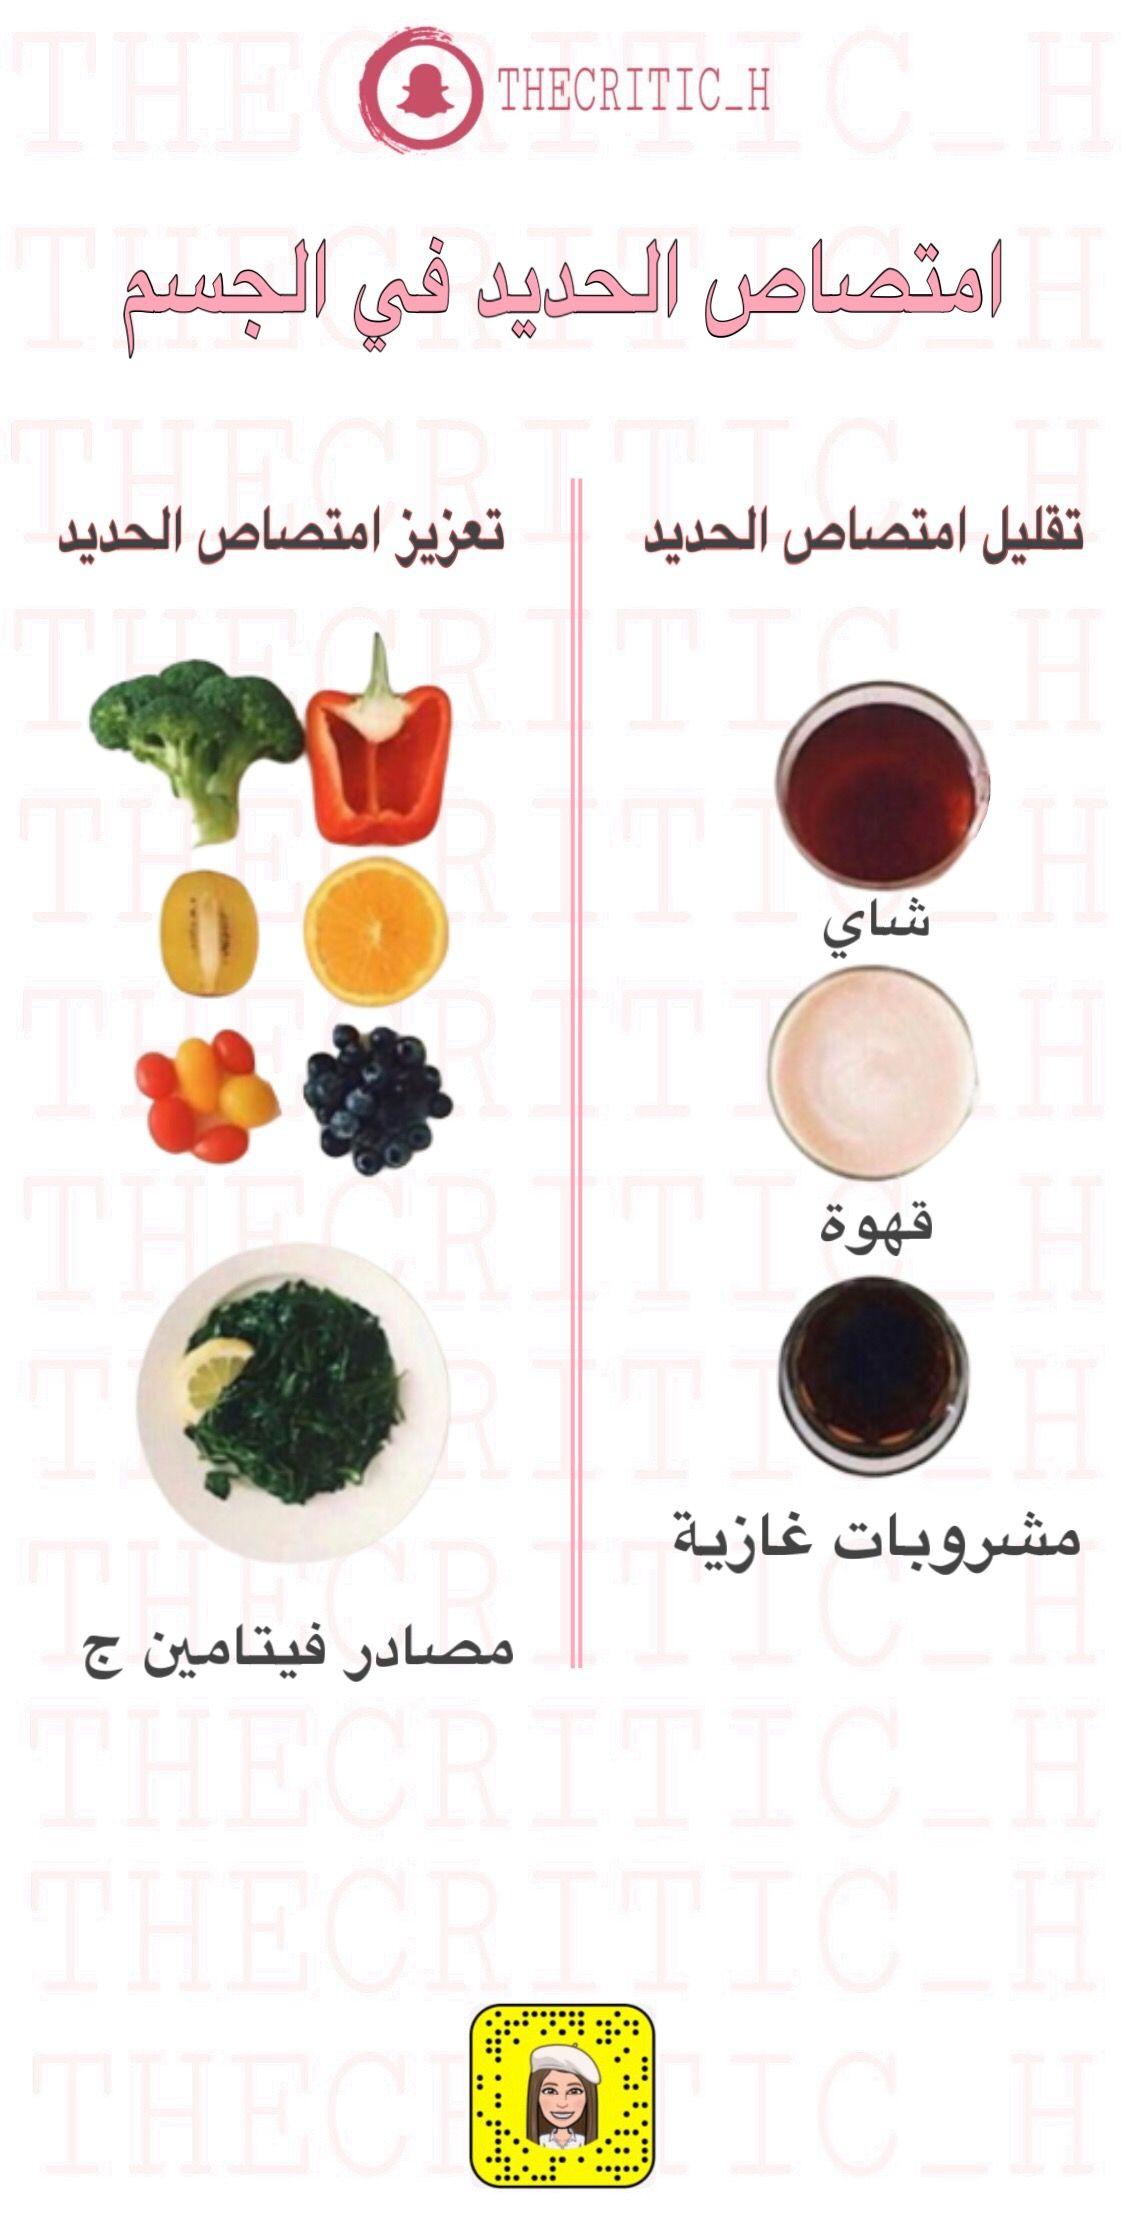 امتصاص الحديد في الجسم Health Facts Food Food Facts Healthy Beauty